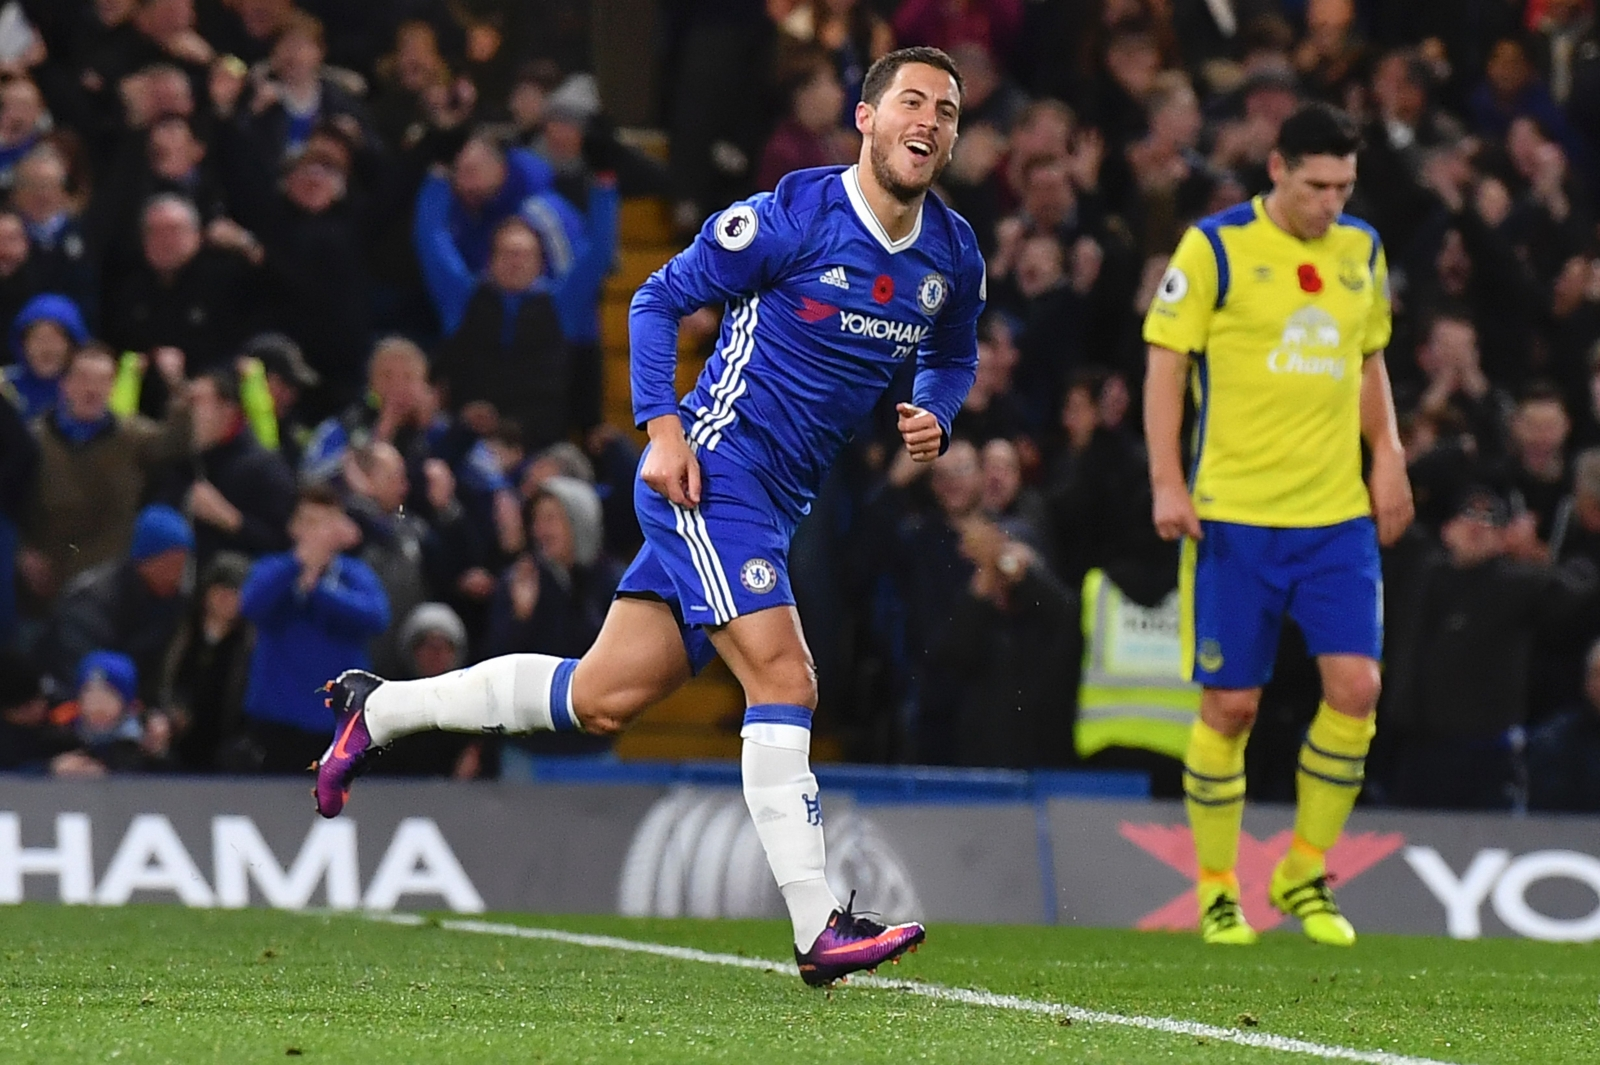 Chelsea 5-0 Everton: Eden Hazard Dazzles Sorry Toffees